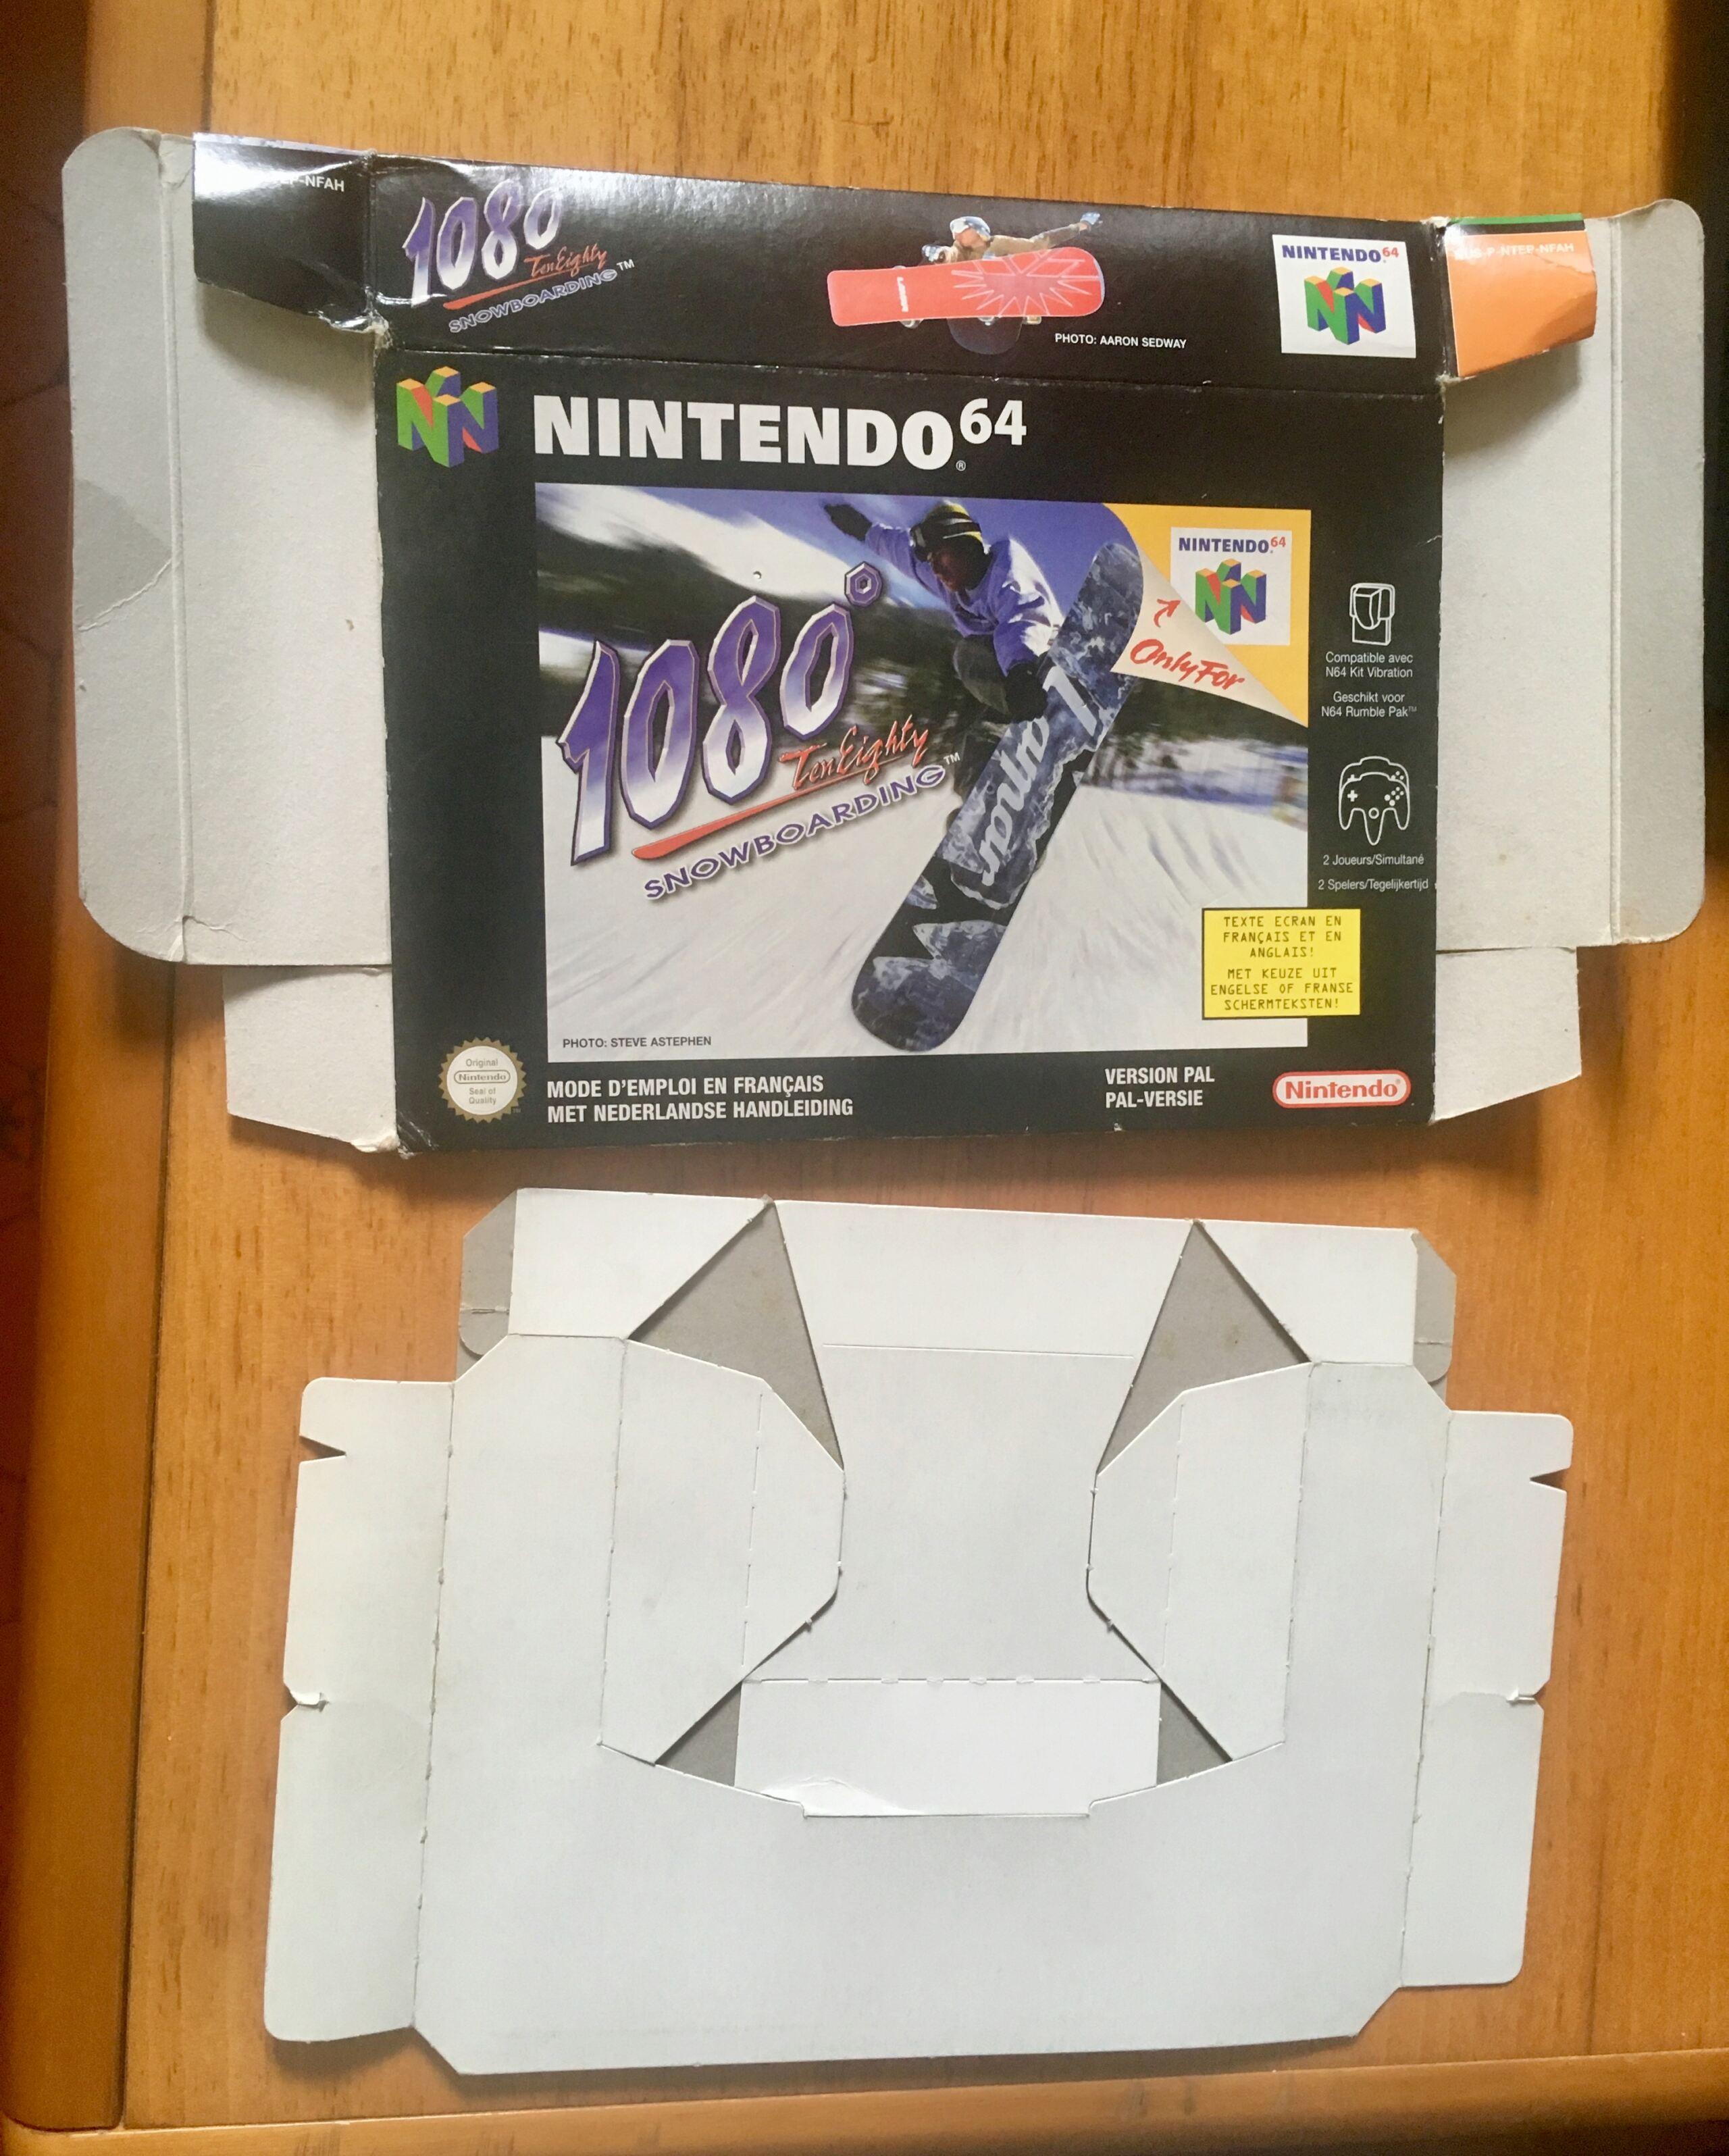 [VDS-ECH] plein d'orphelins: Boite+notice wiiU pack MKSplatoon, Notice Megadrive N64 Ps1, Boite notice R-Types, Pokemon Img_3813